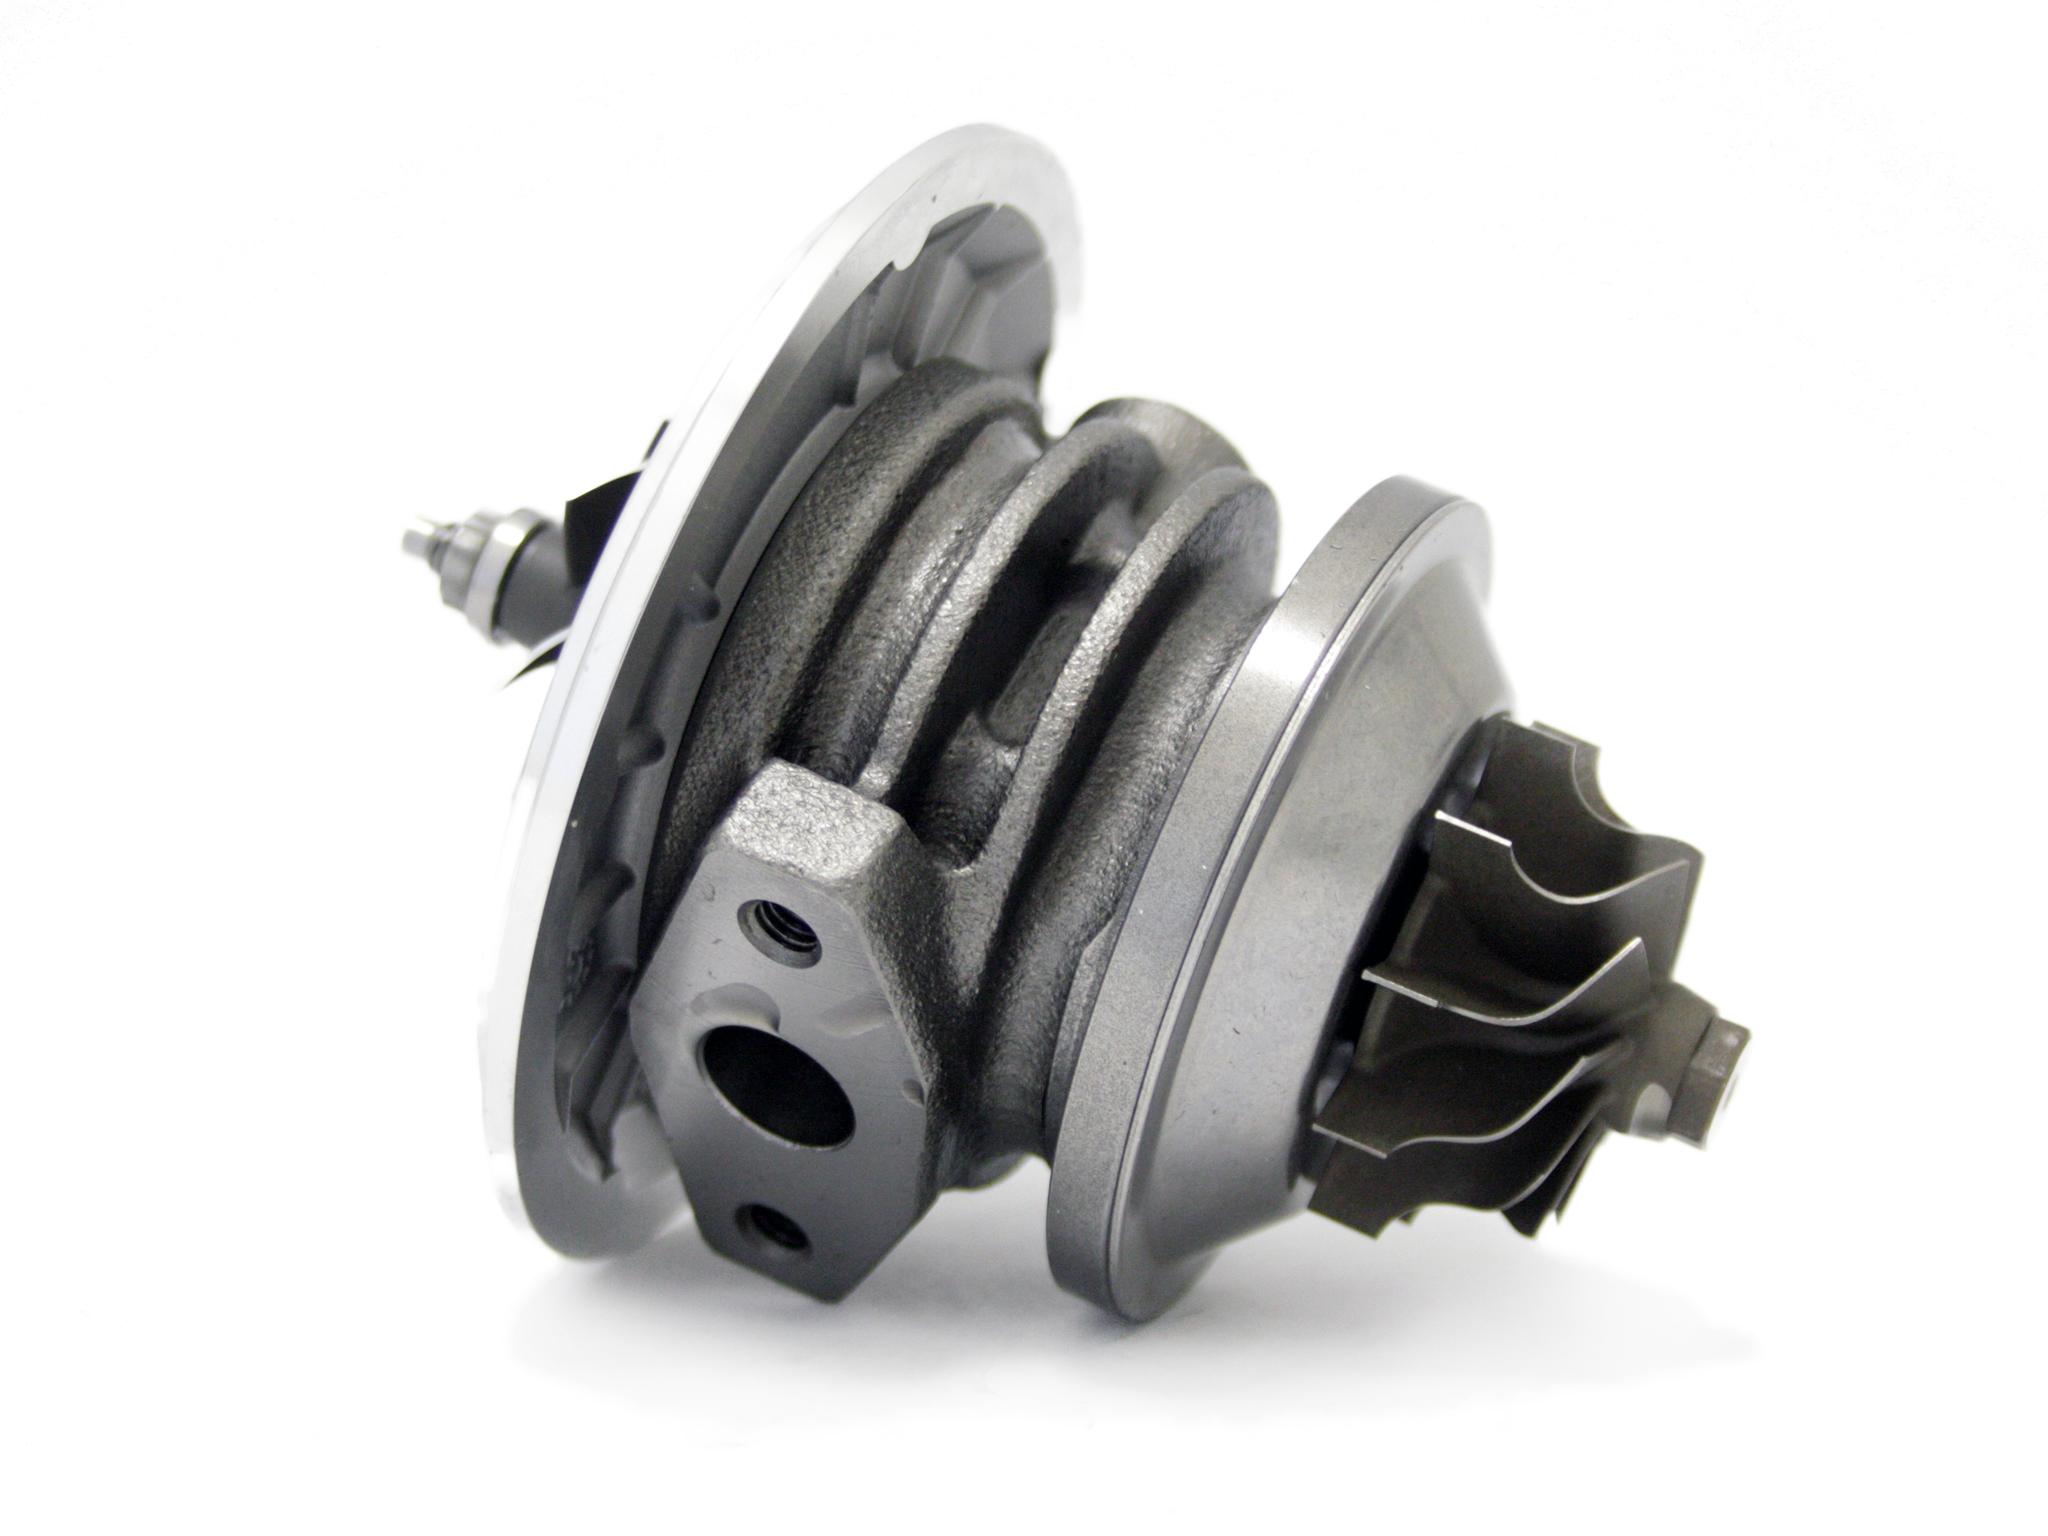 Картридж турбины GT1544 Опель 2.0 X20DTL 82 л.с.